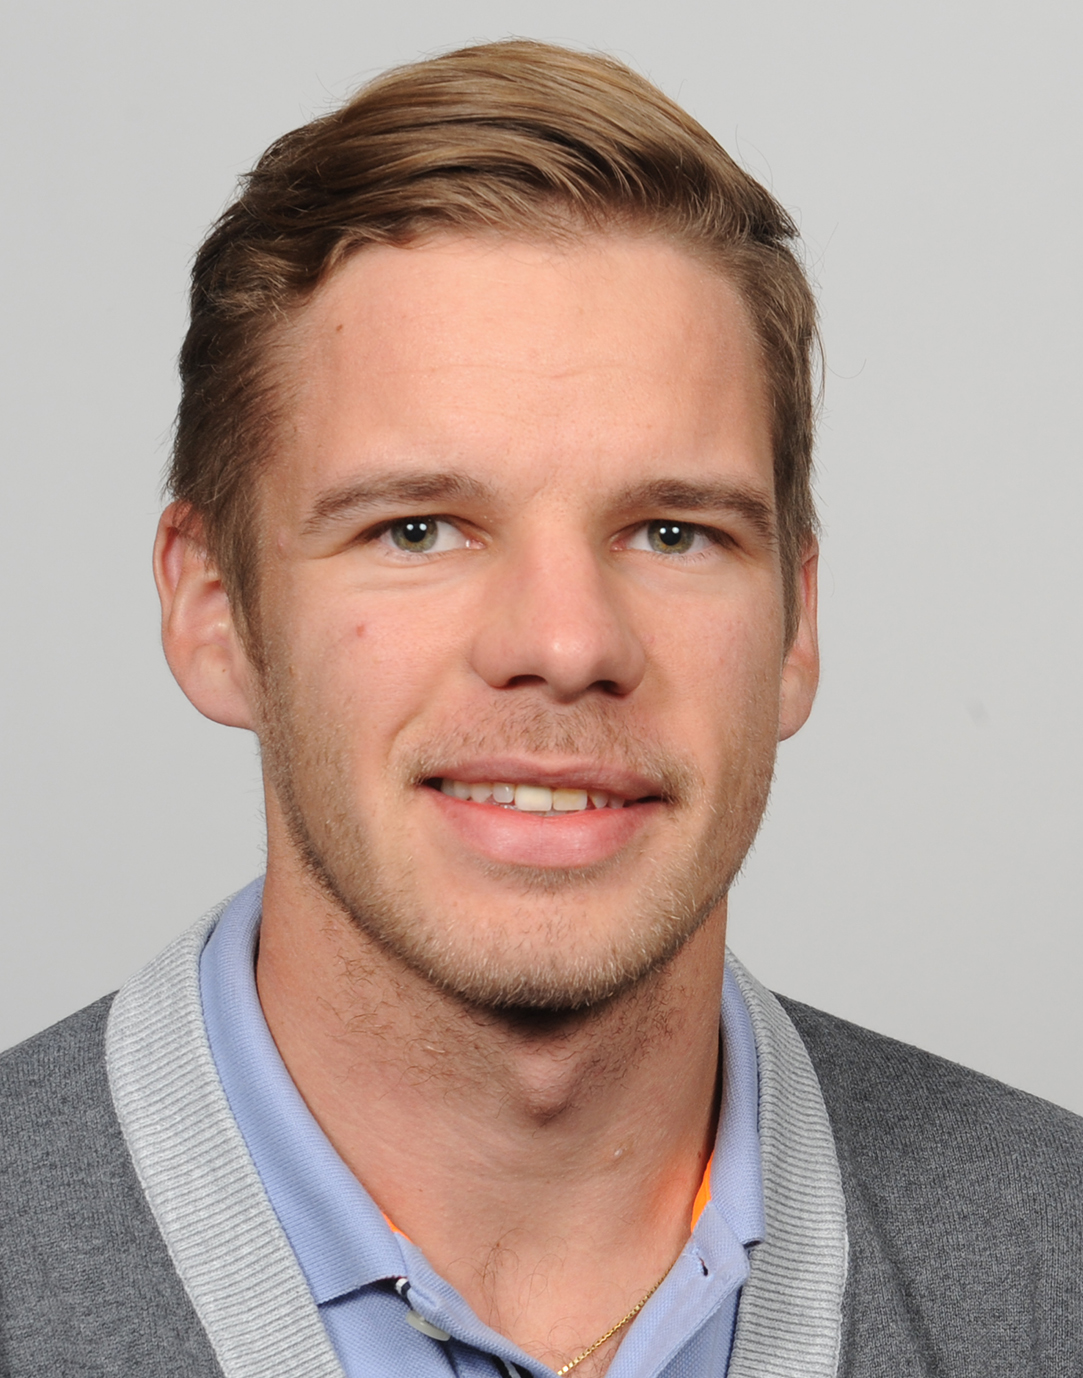 Fabian Grossmann, Doktorand